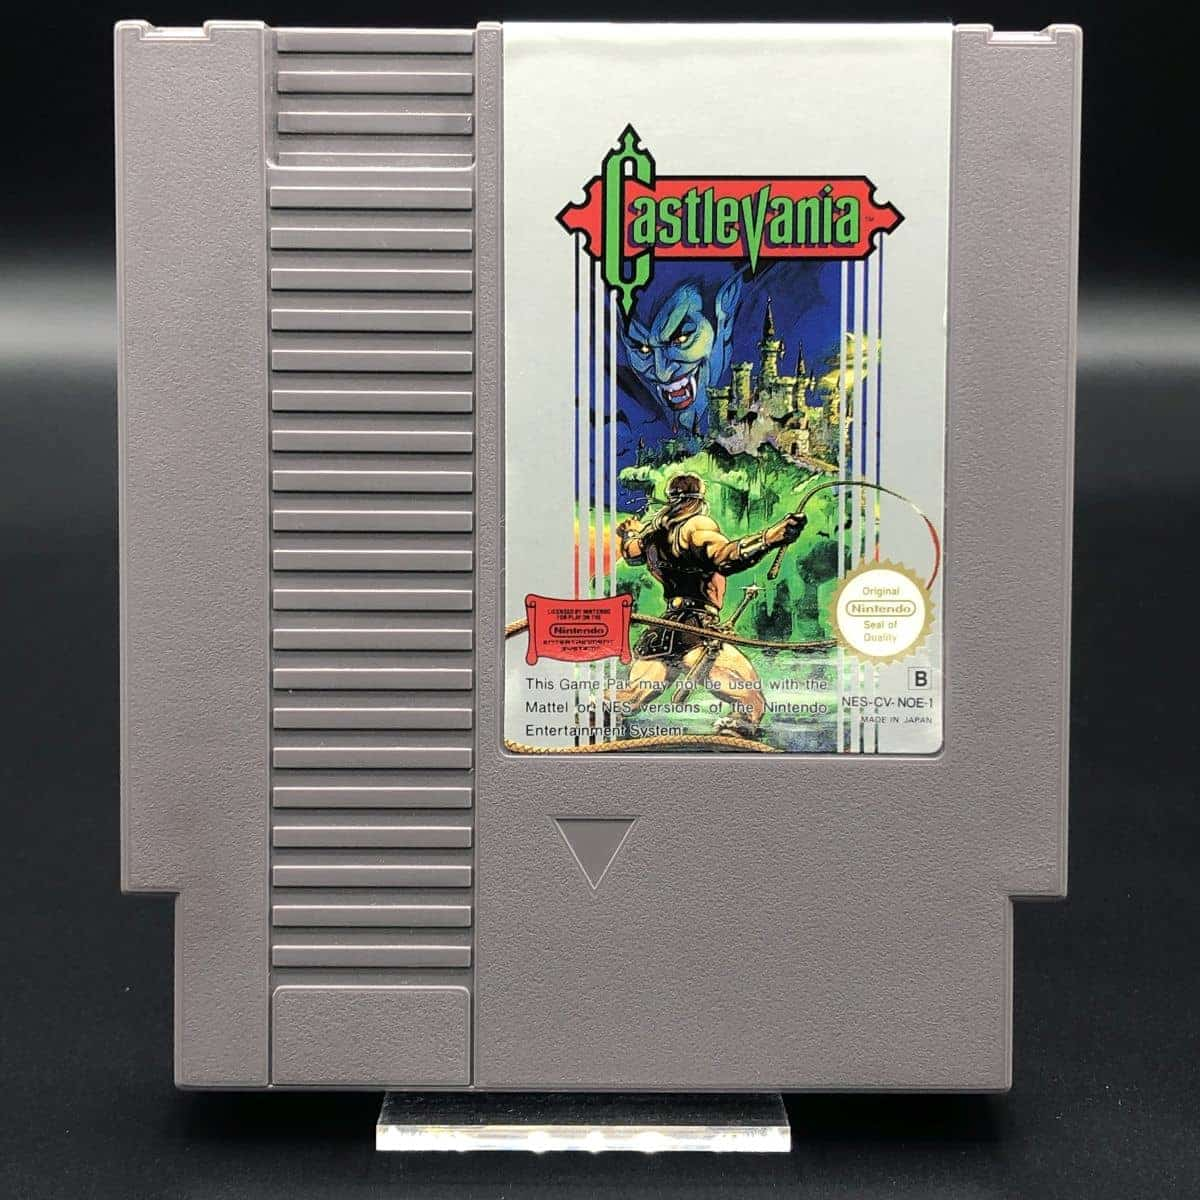 NES Castlevania (Modul) (Sehr gut) Nintendo Entertainment System